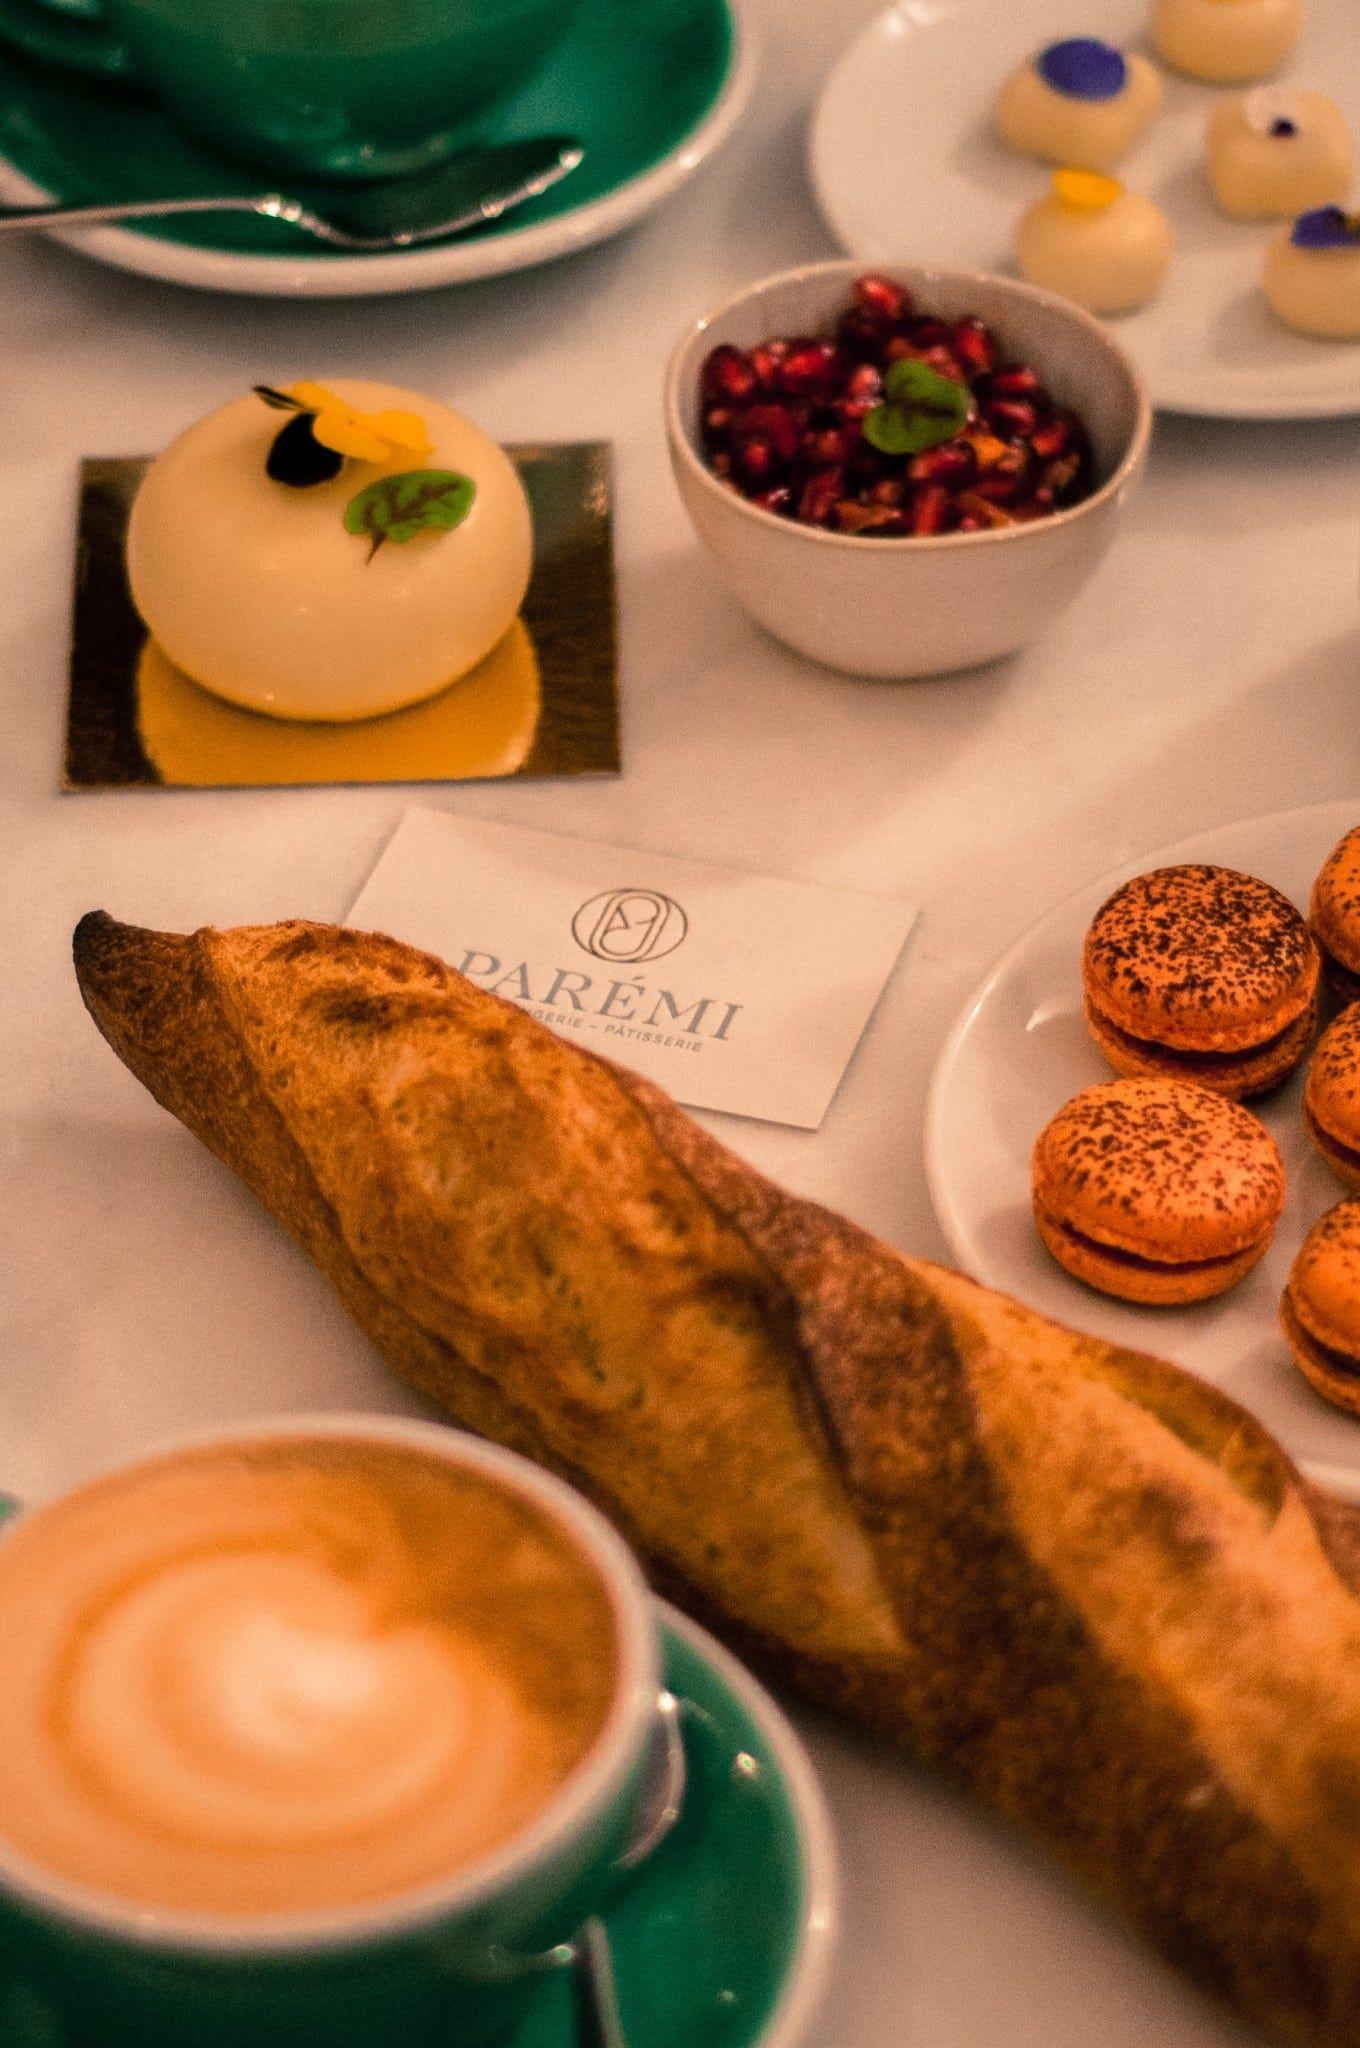 Bäckerei Parémi